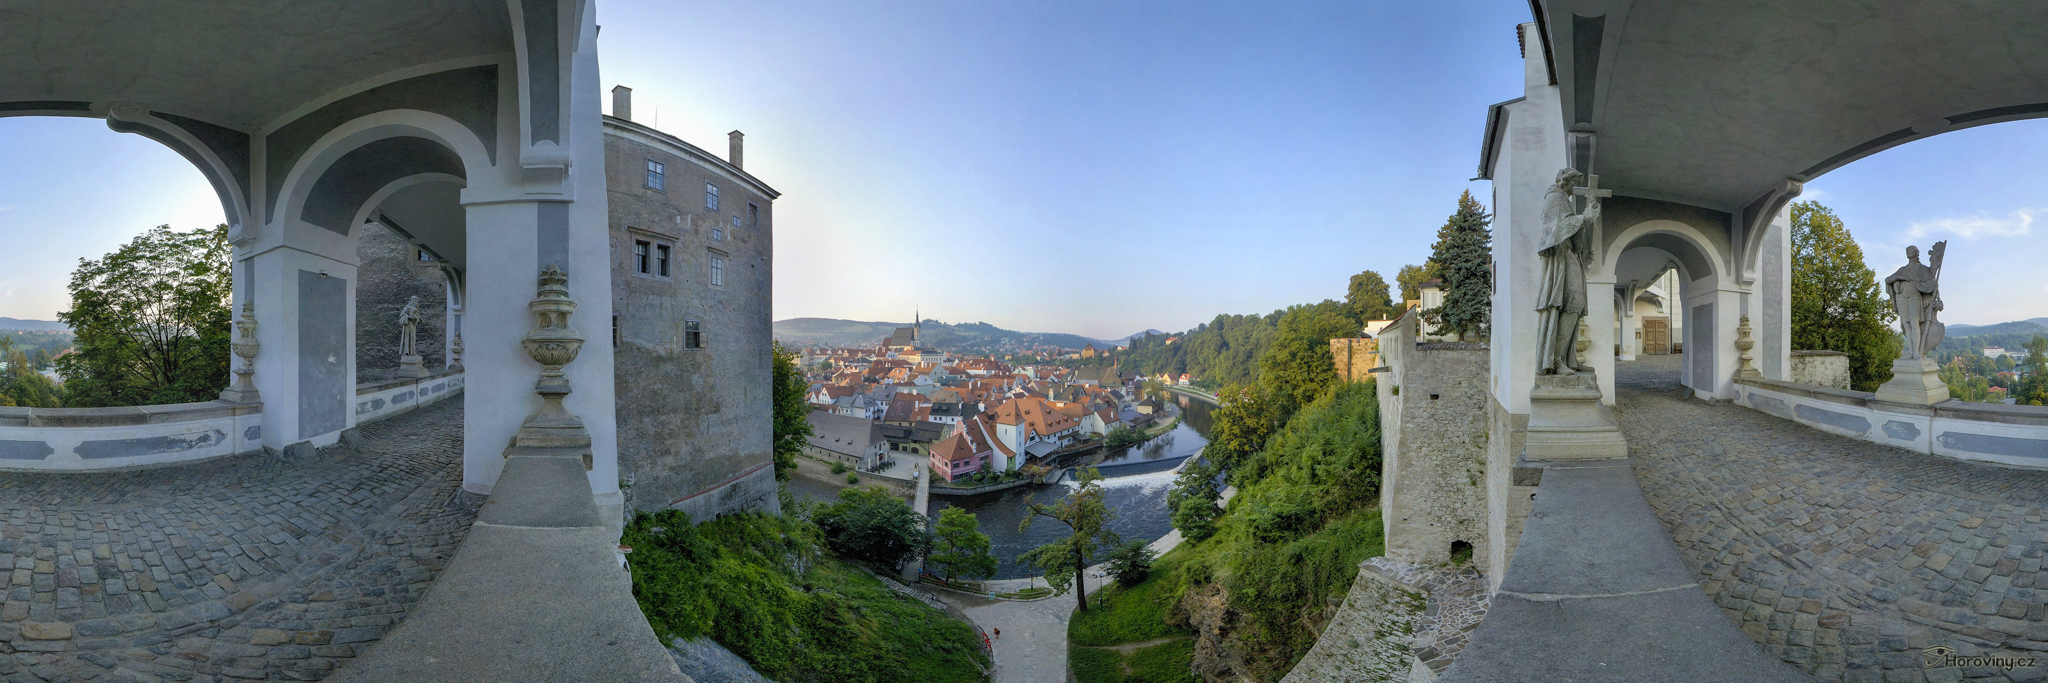 From the Plášť Bridge